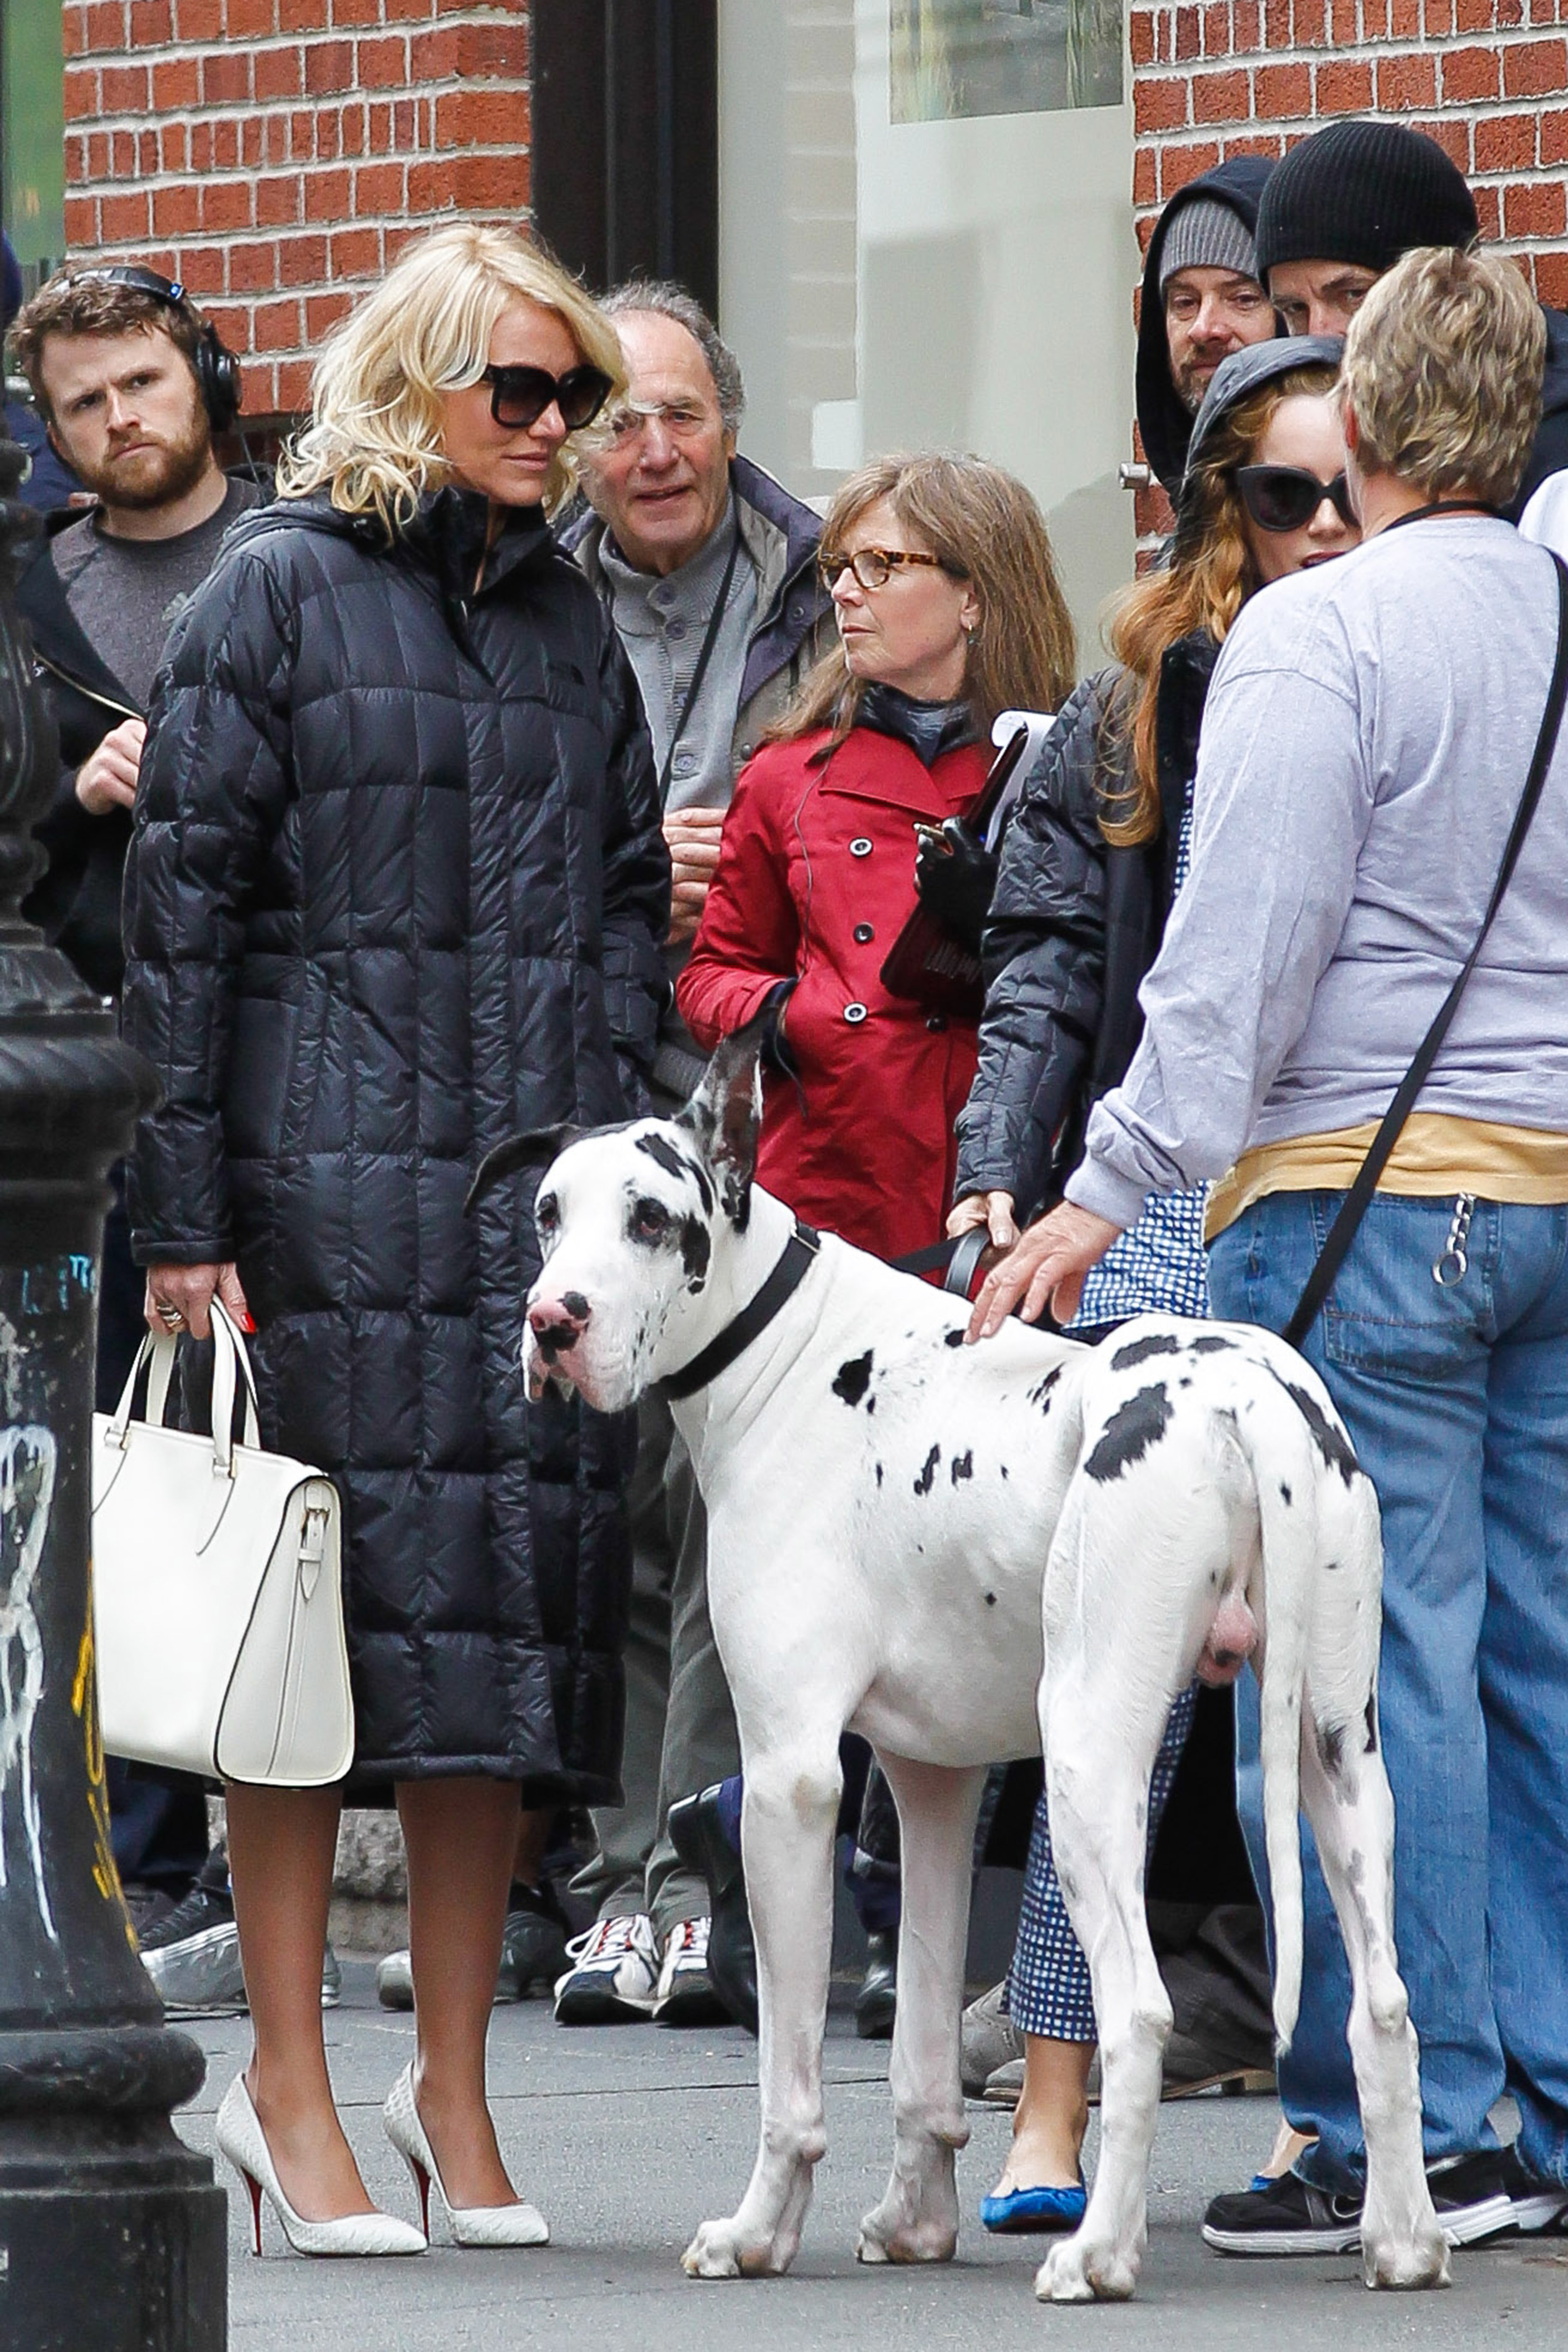 Cameron Diaz and Leslie Mann filming dog